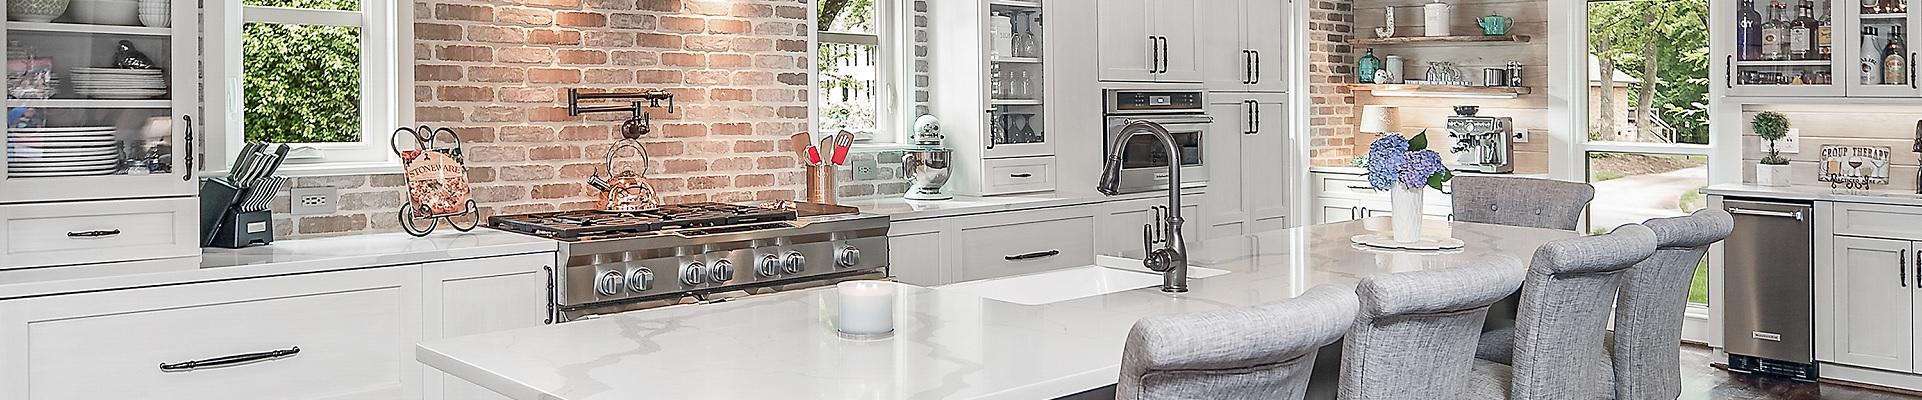 Super Reico Kitchen Bath Download Free Architecture Designs Grimeyleaguecom